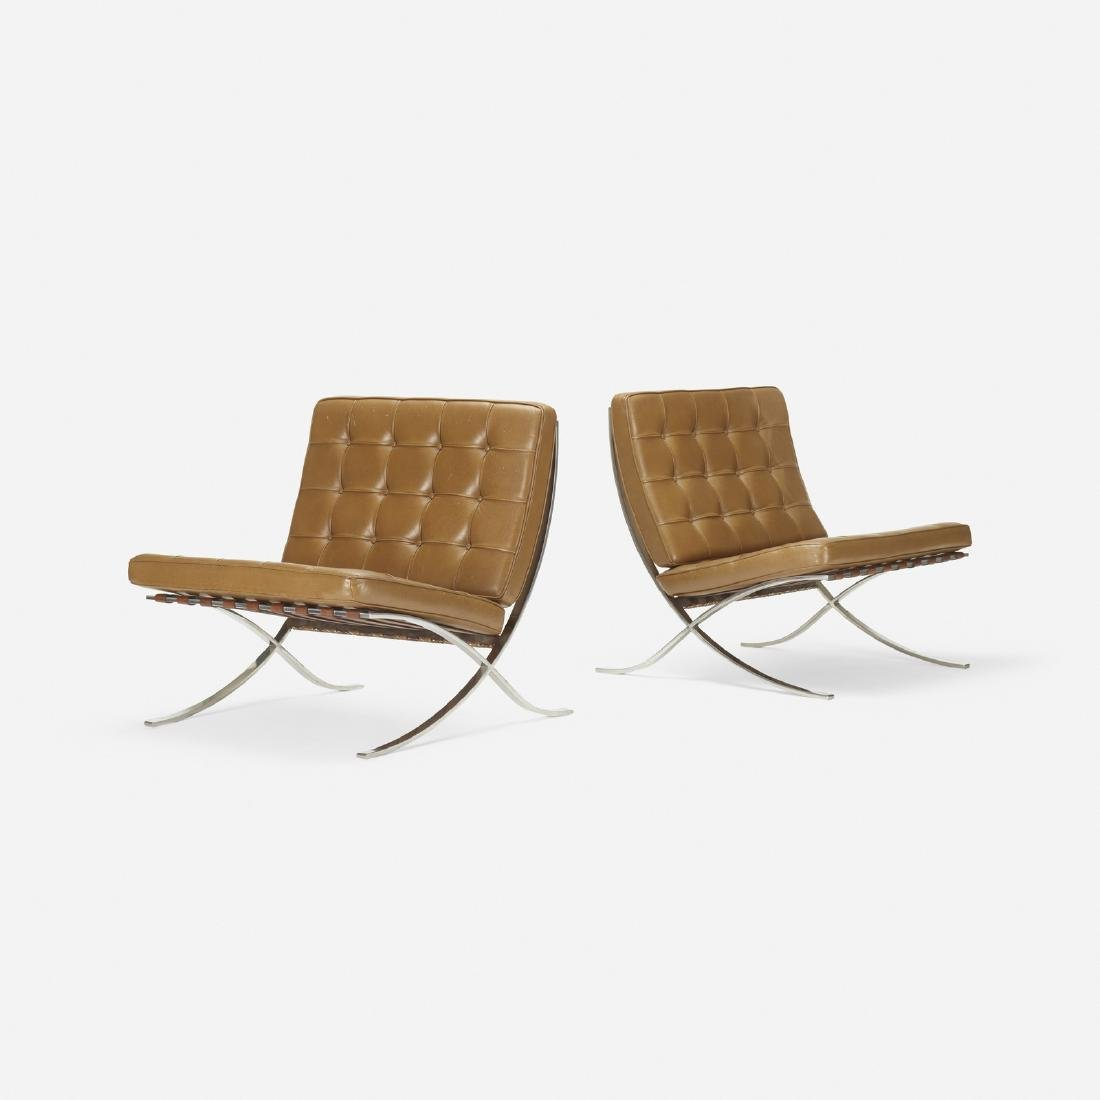 Ludwig Mies van der Rohe, Barcelona chairs, pair